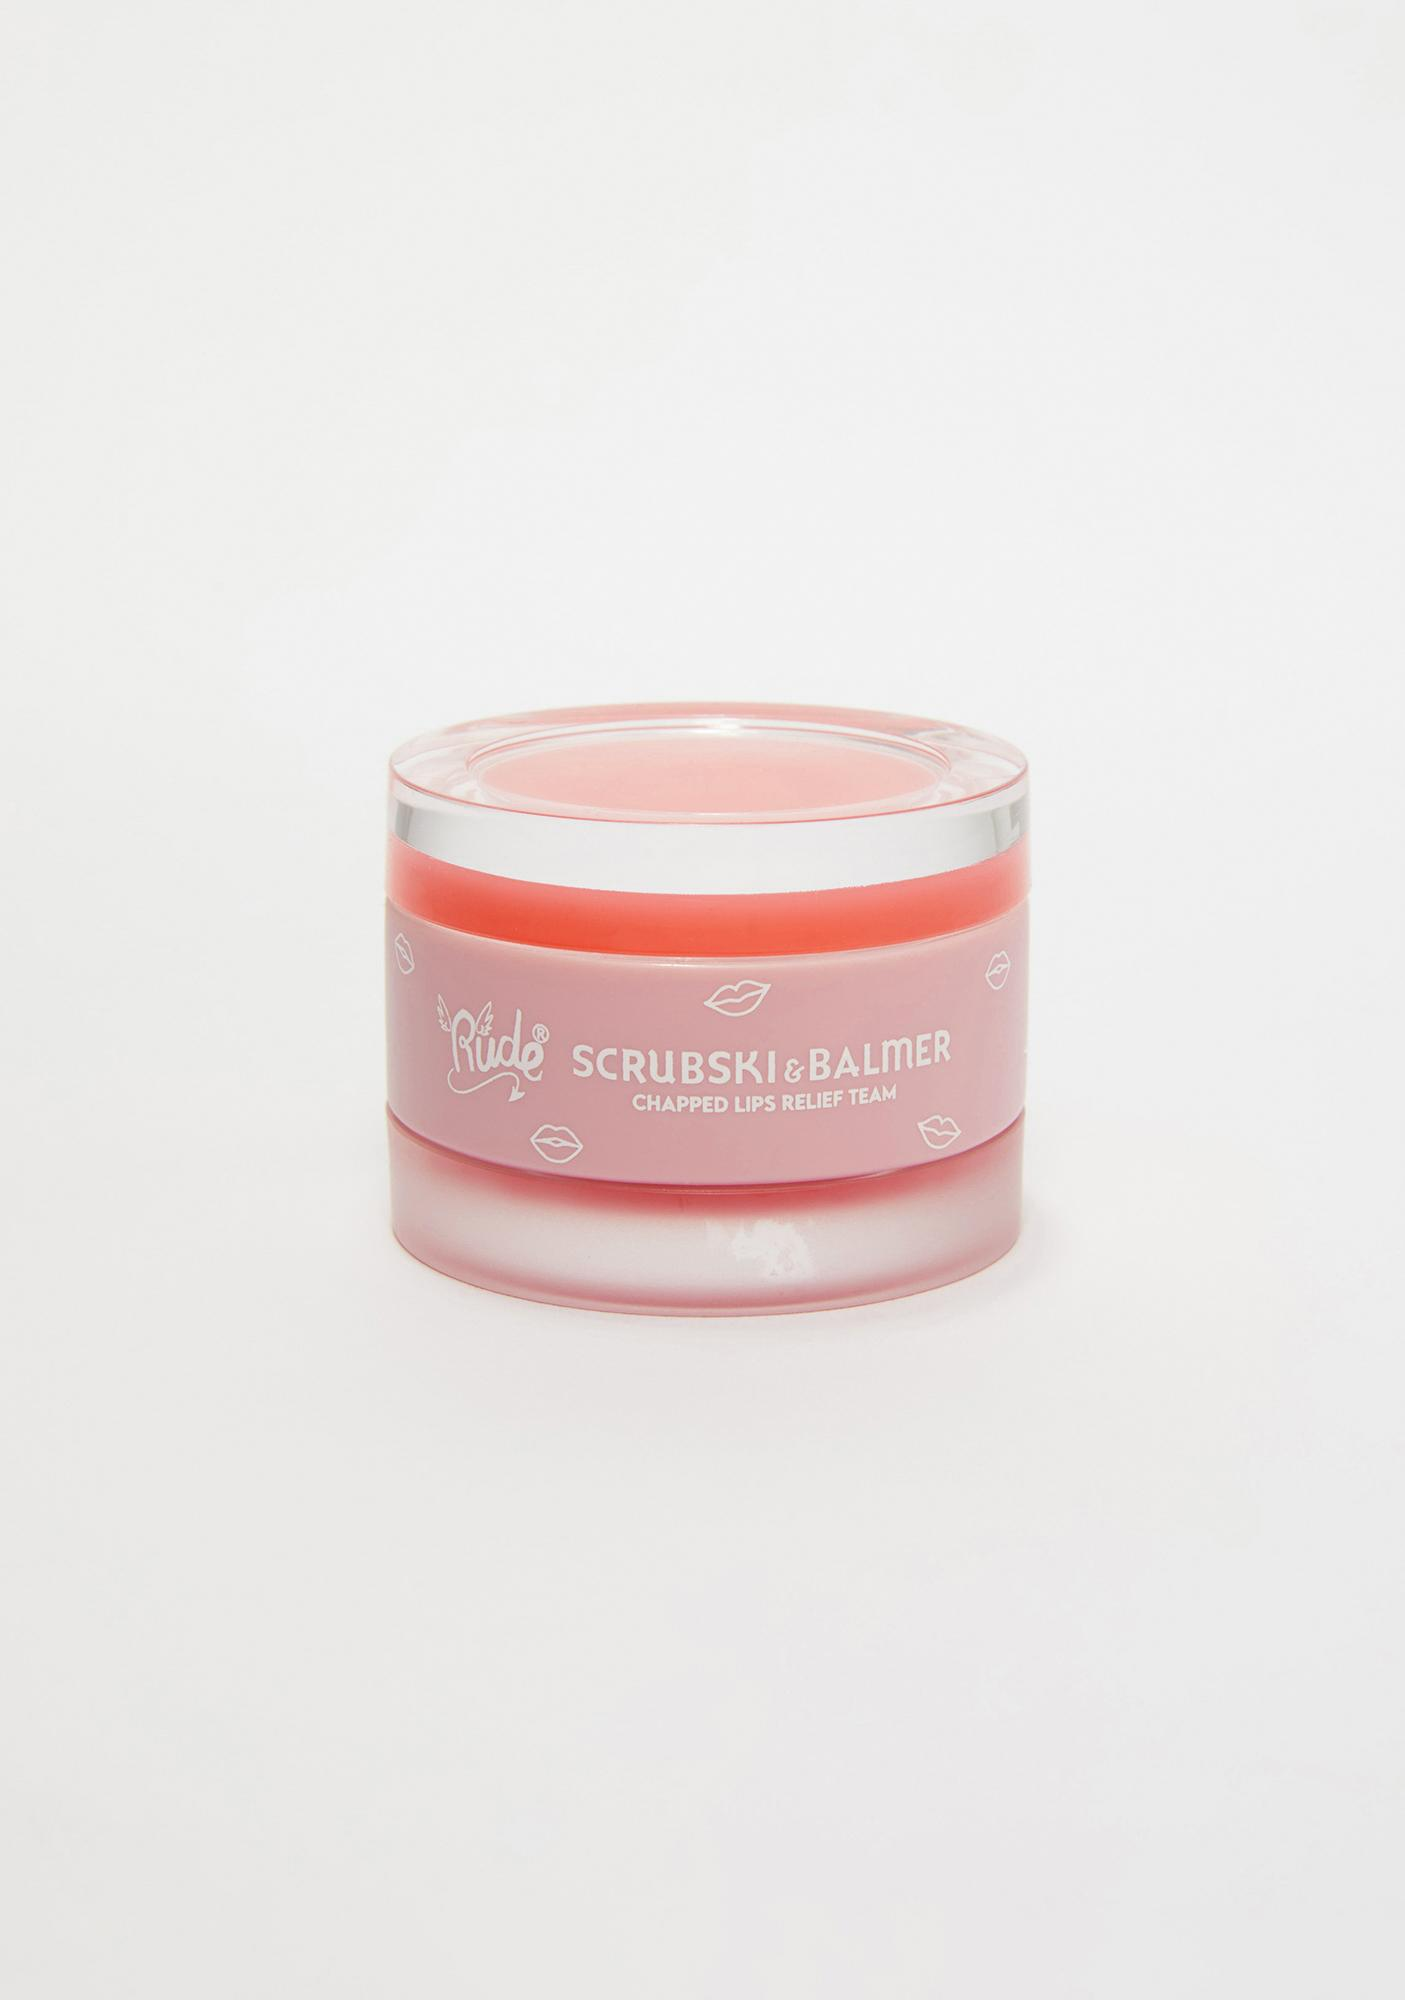 Rude Cosmetics Peach Scrubski & Balmer Lip Exfoliator